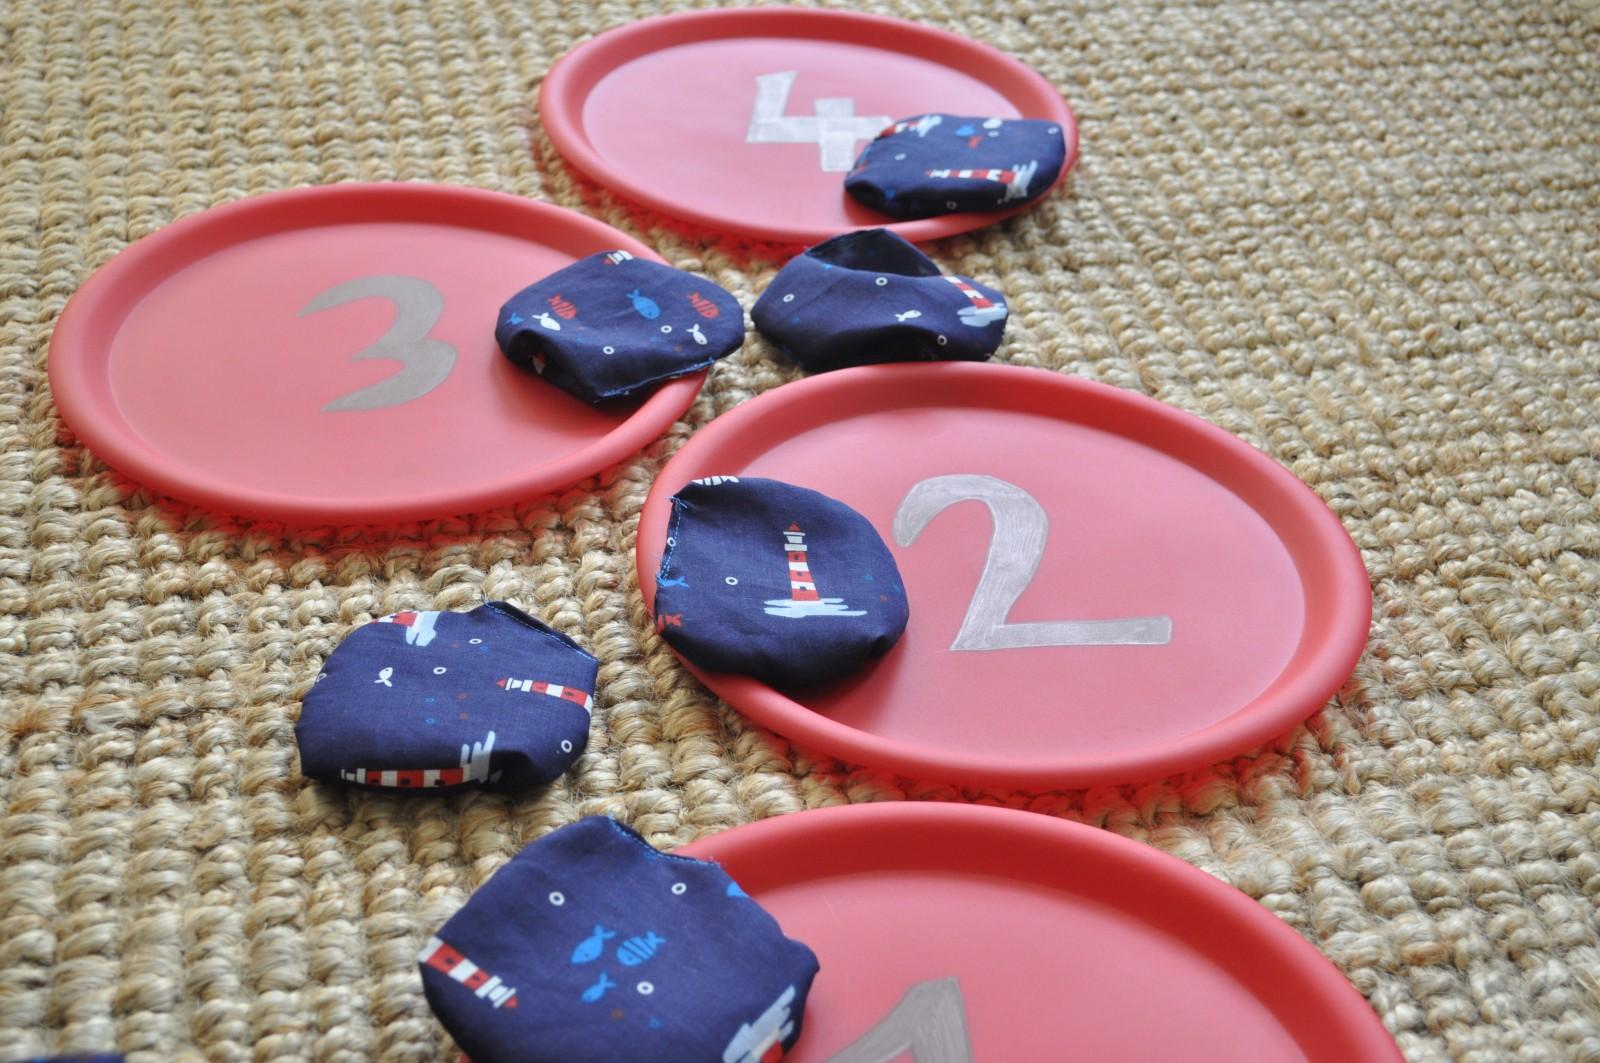 Beanbag toss – easy homemade kids game for the holidays